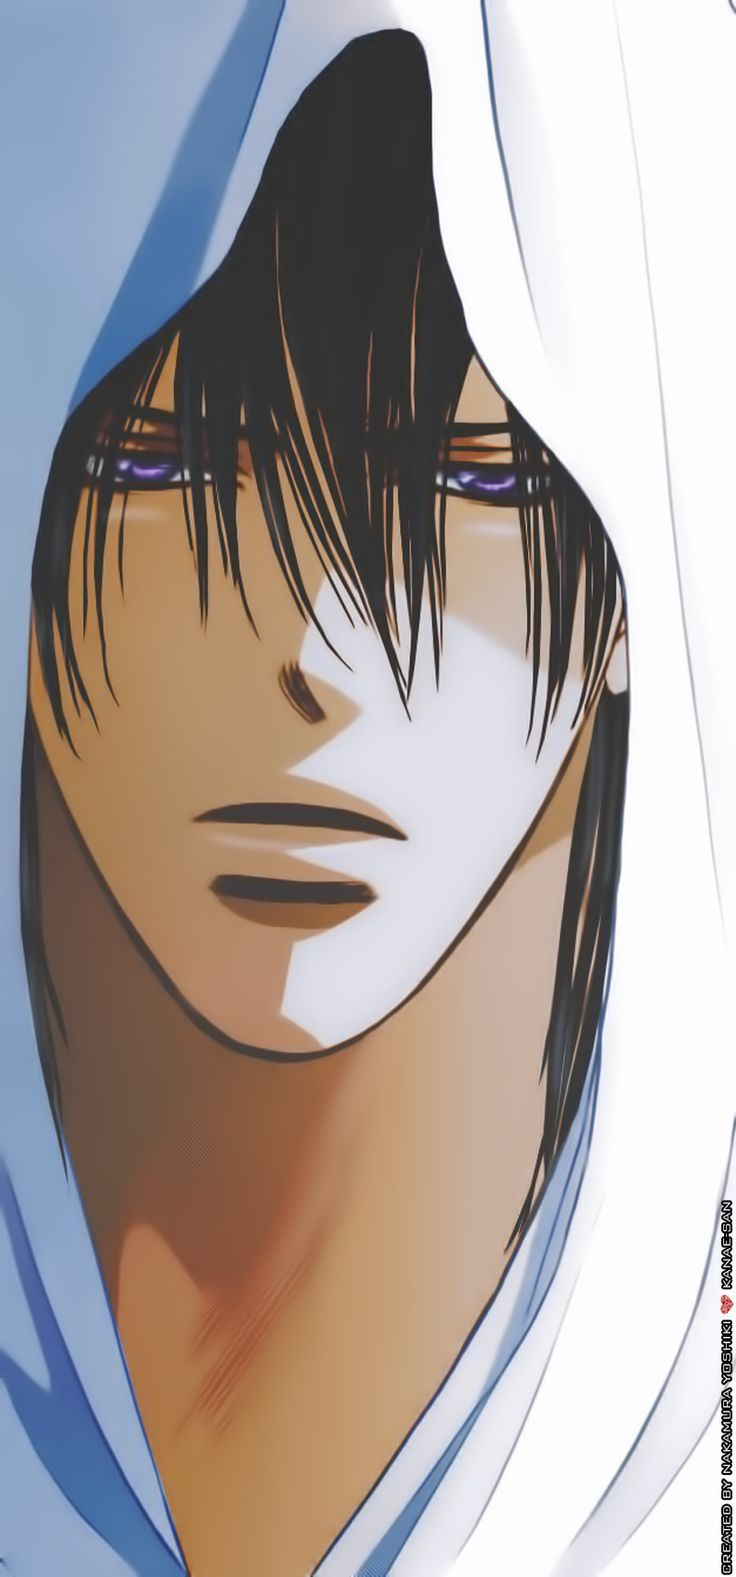 Tsuruga Ren | Skip Beat | ♧ Manga ♧